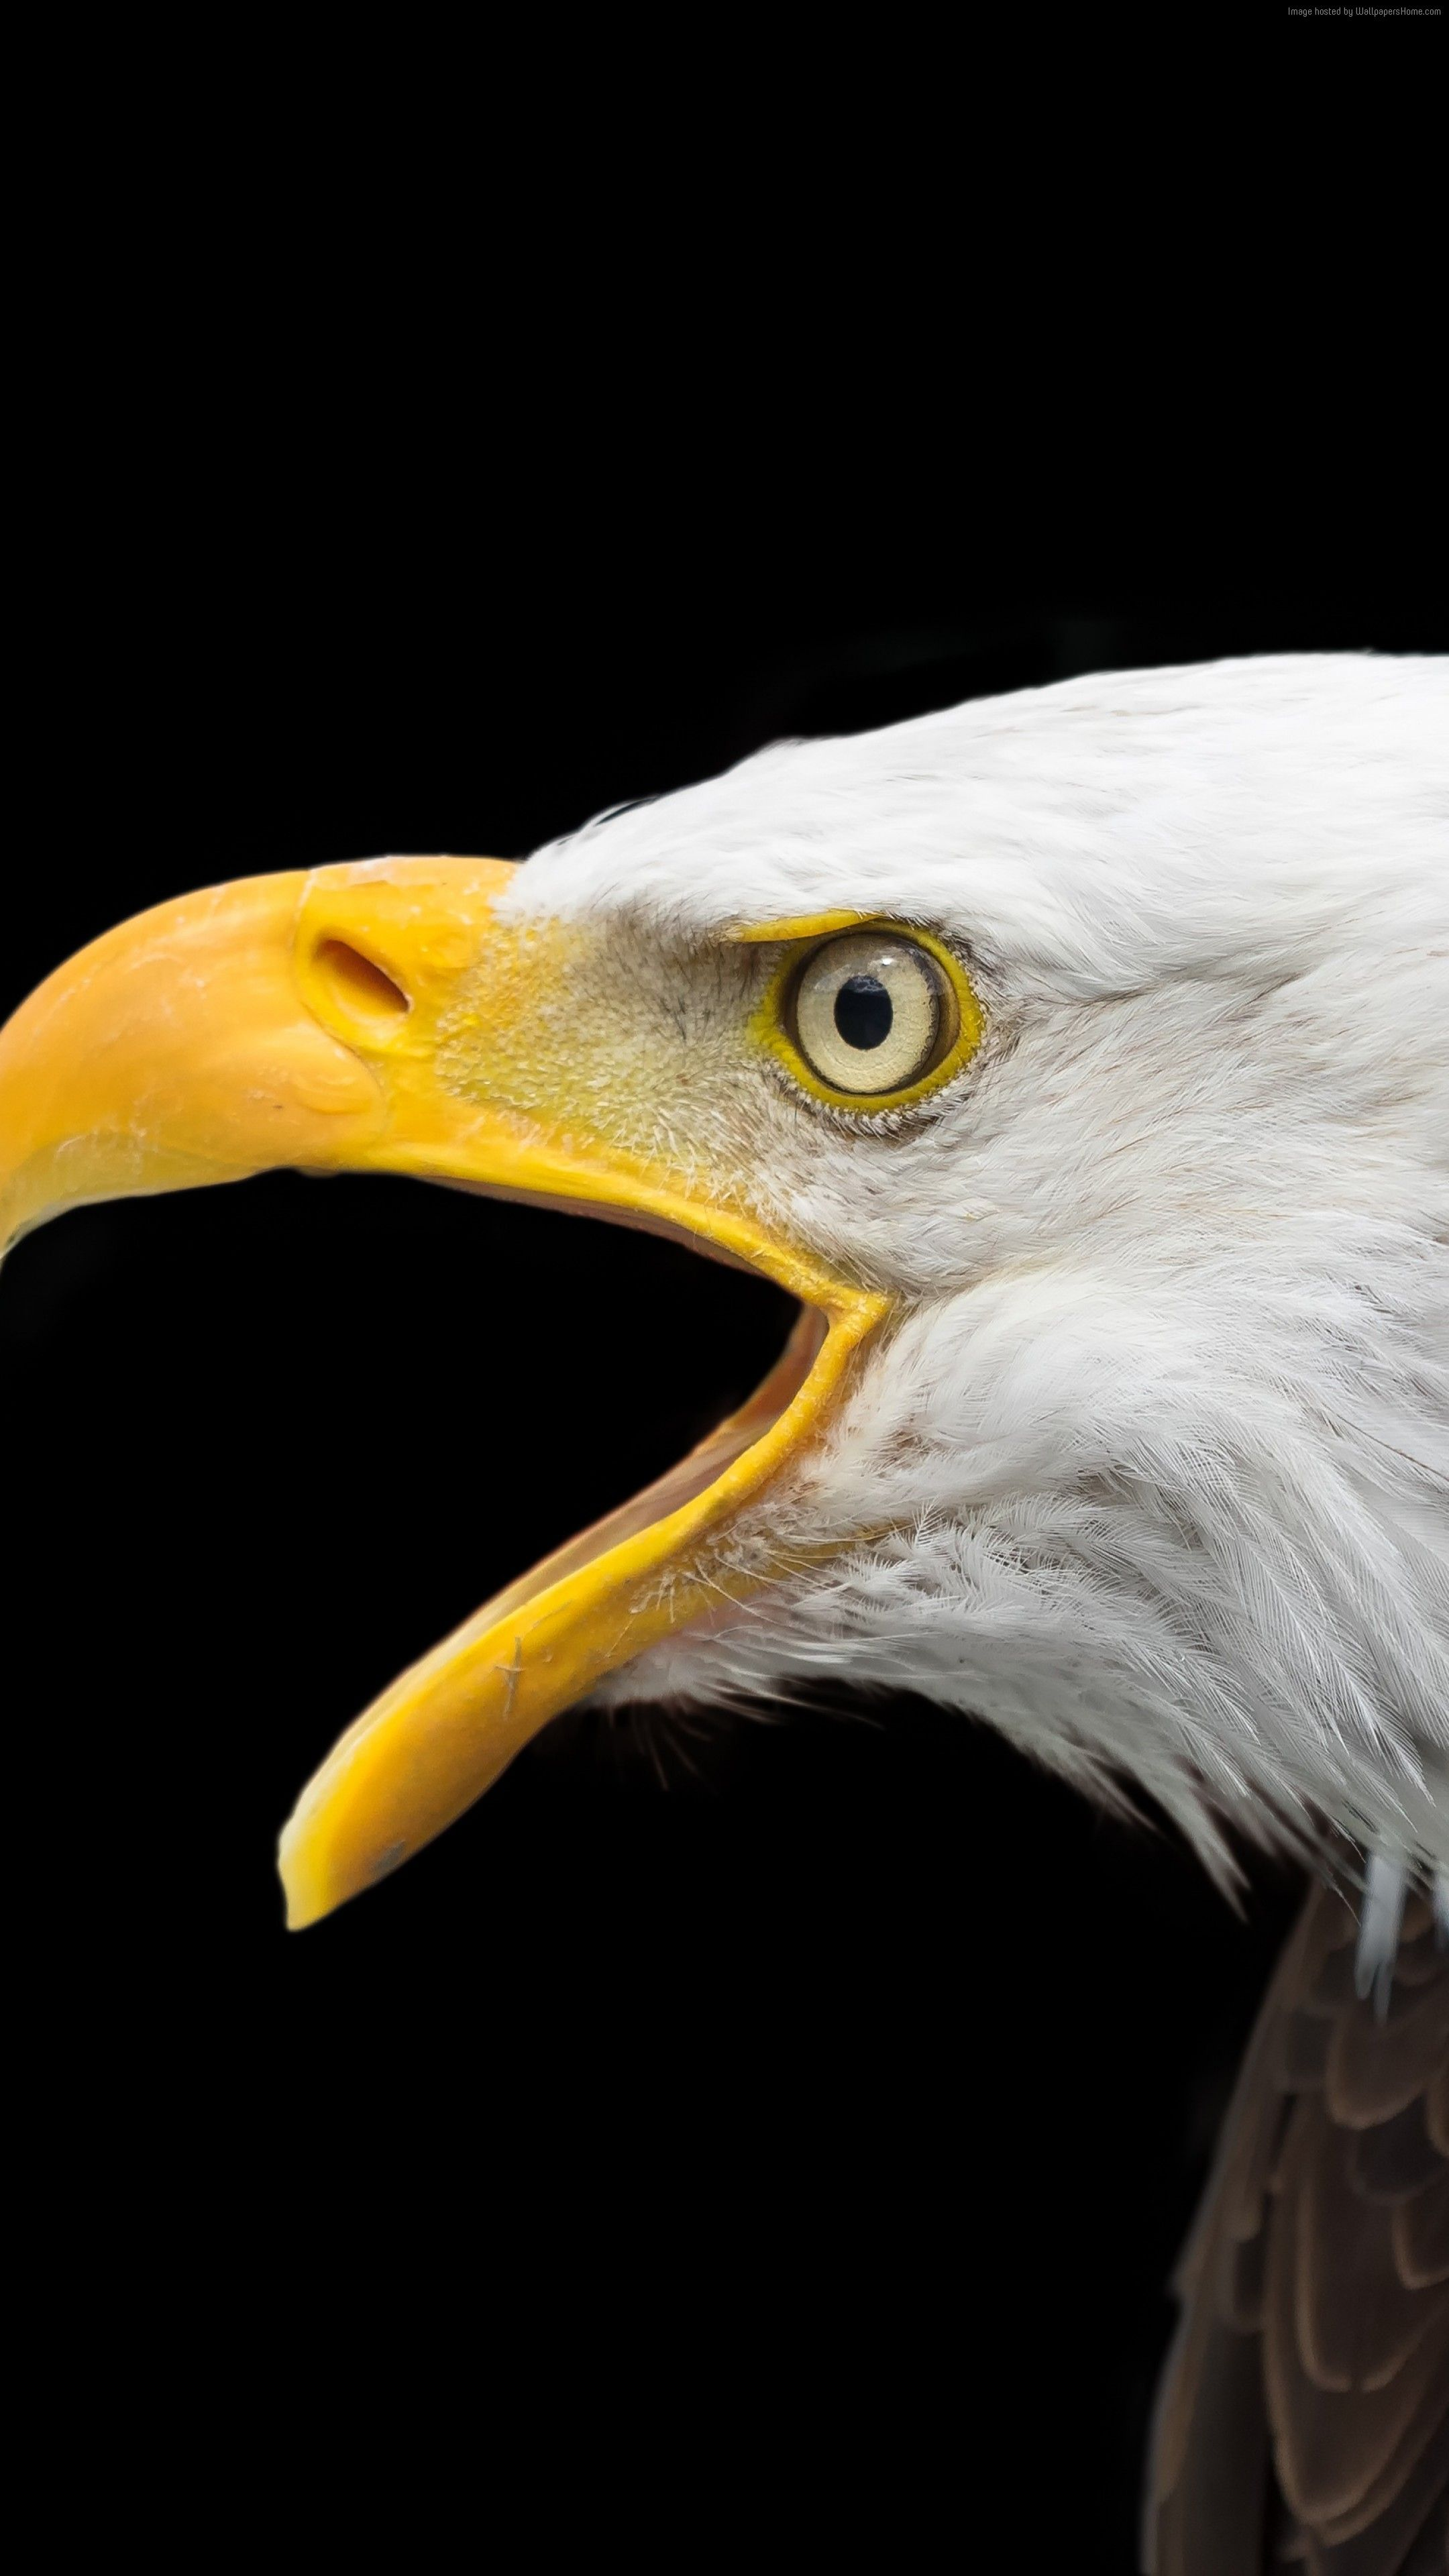 Pin By Wallpaper Hd On Wallpaper Hd Eagle Wallpaper Eagle Eagle